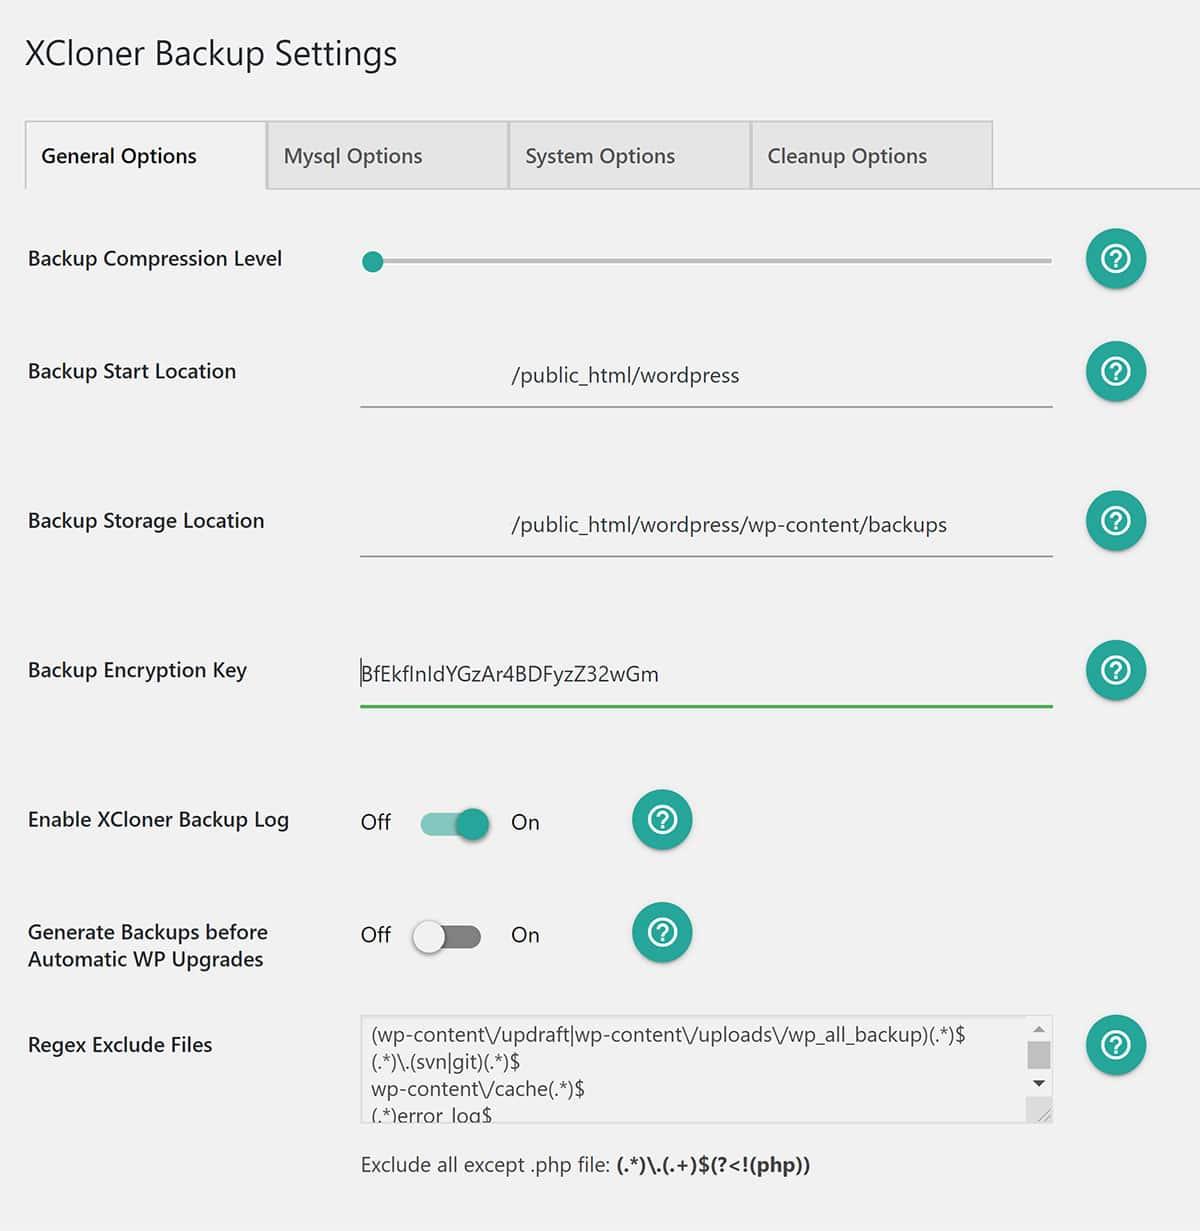 XCloner Backup Settings